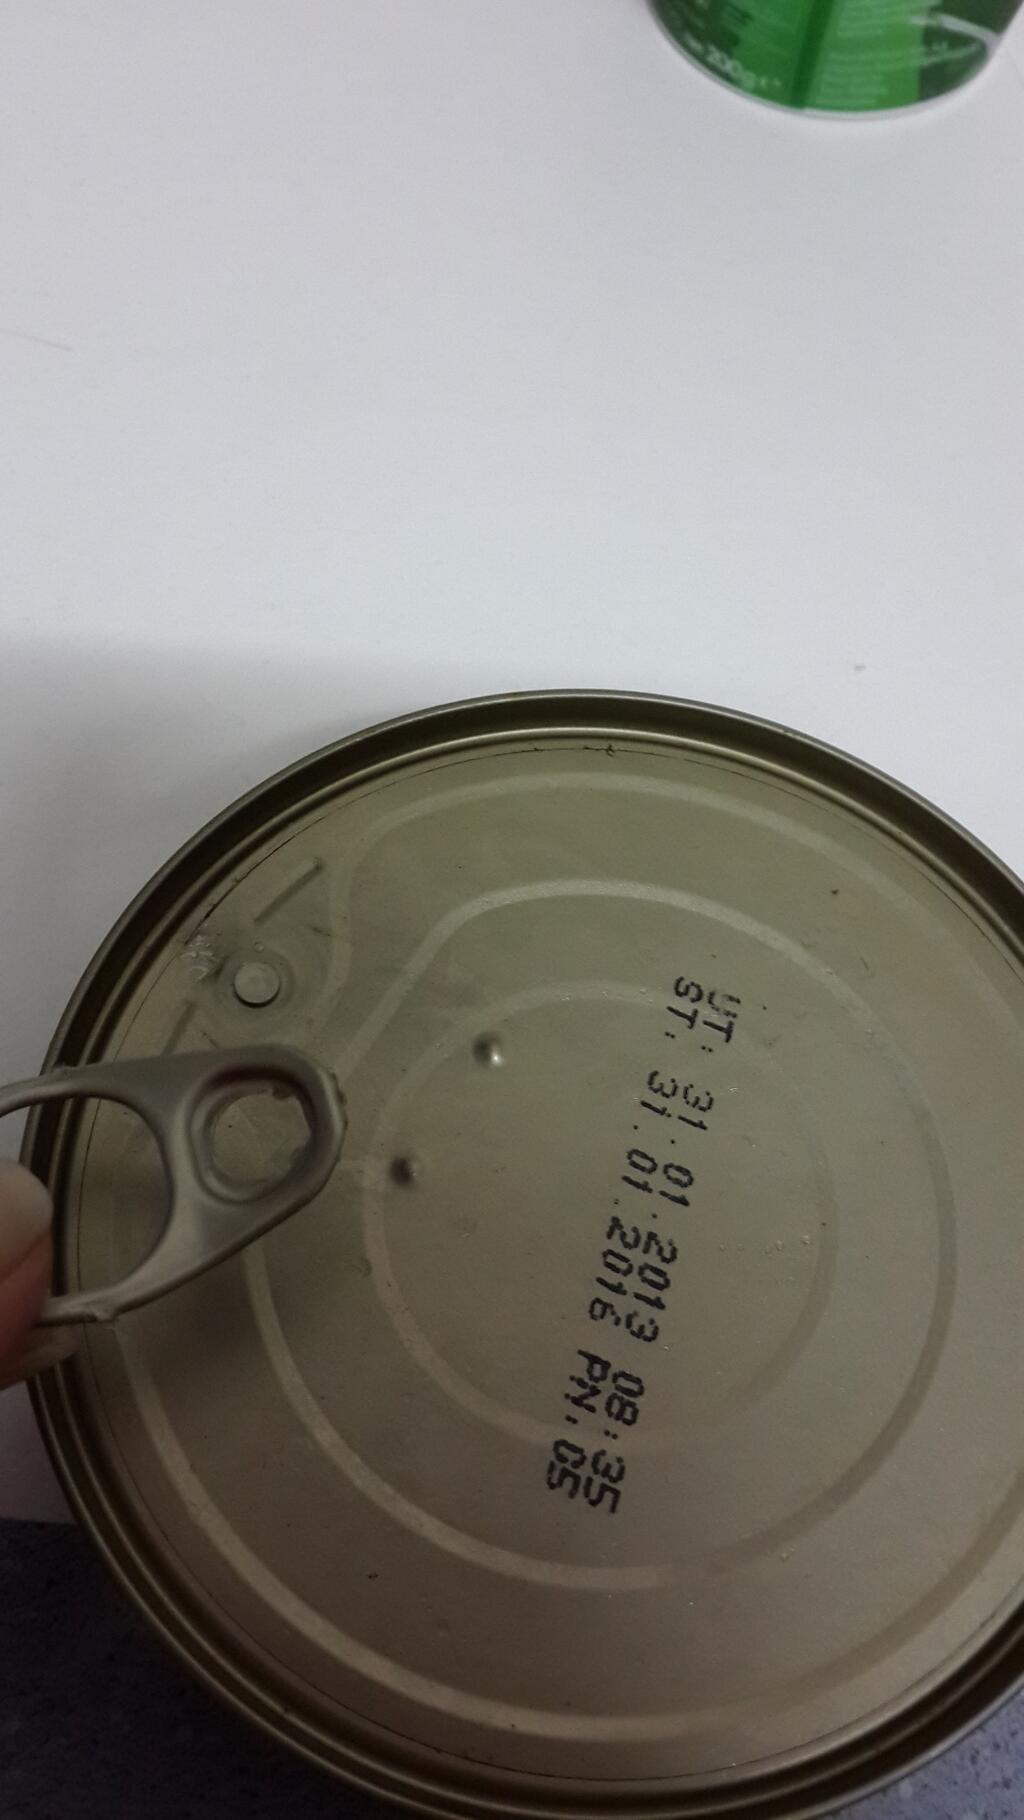 gonul-gozu-kapanan-ton-baligi-konservesi